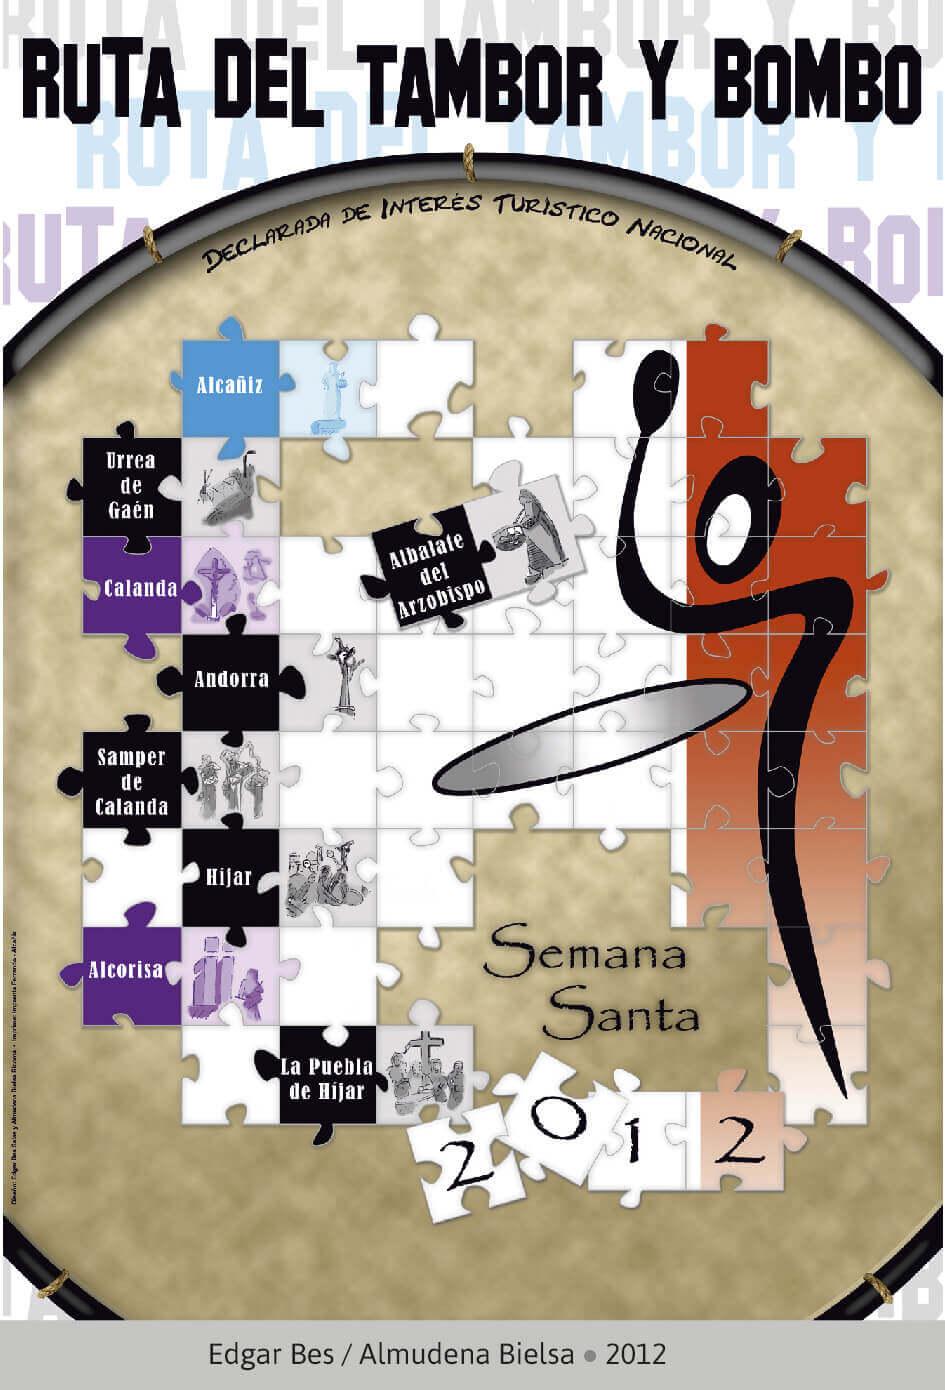 Cartel Ganador Ruta del Tambor y Bombo. Semana Santa 2012